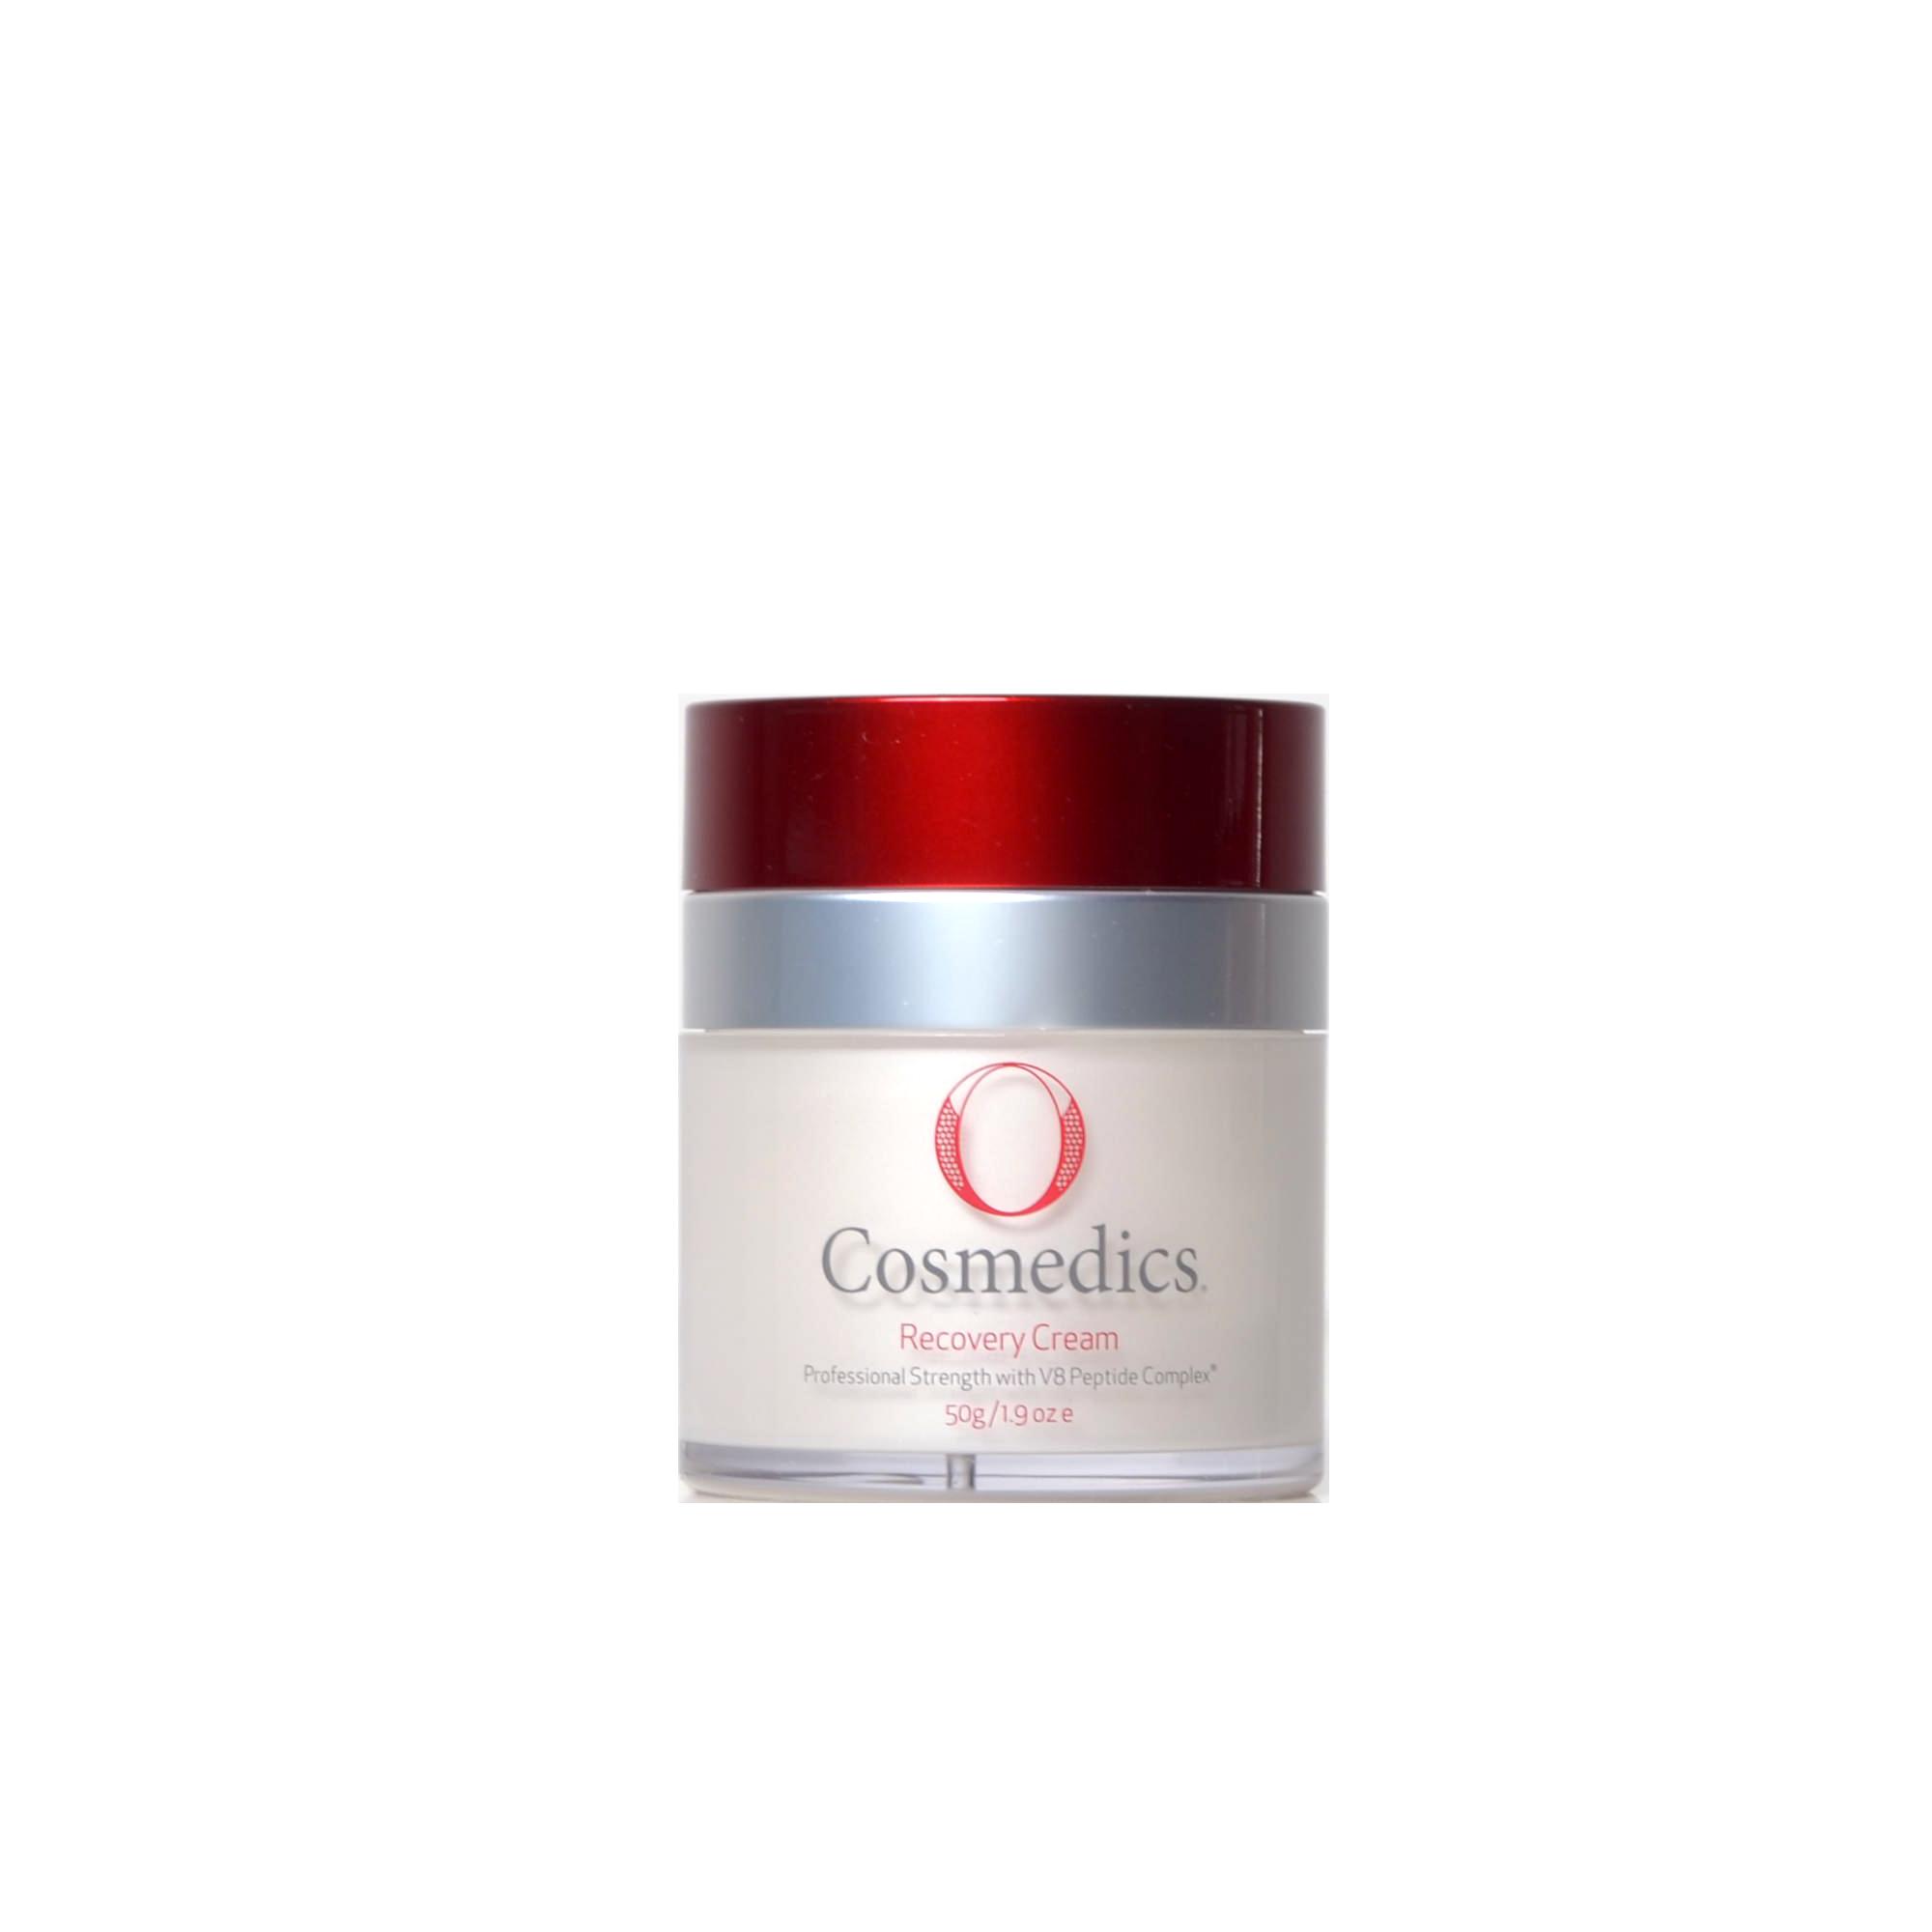 Recovery Cream - 50g